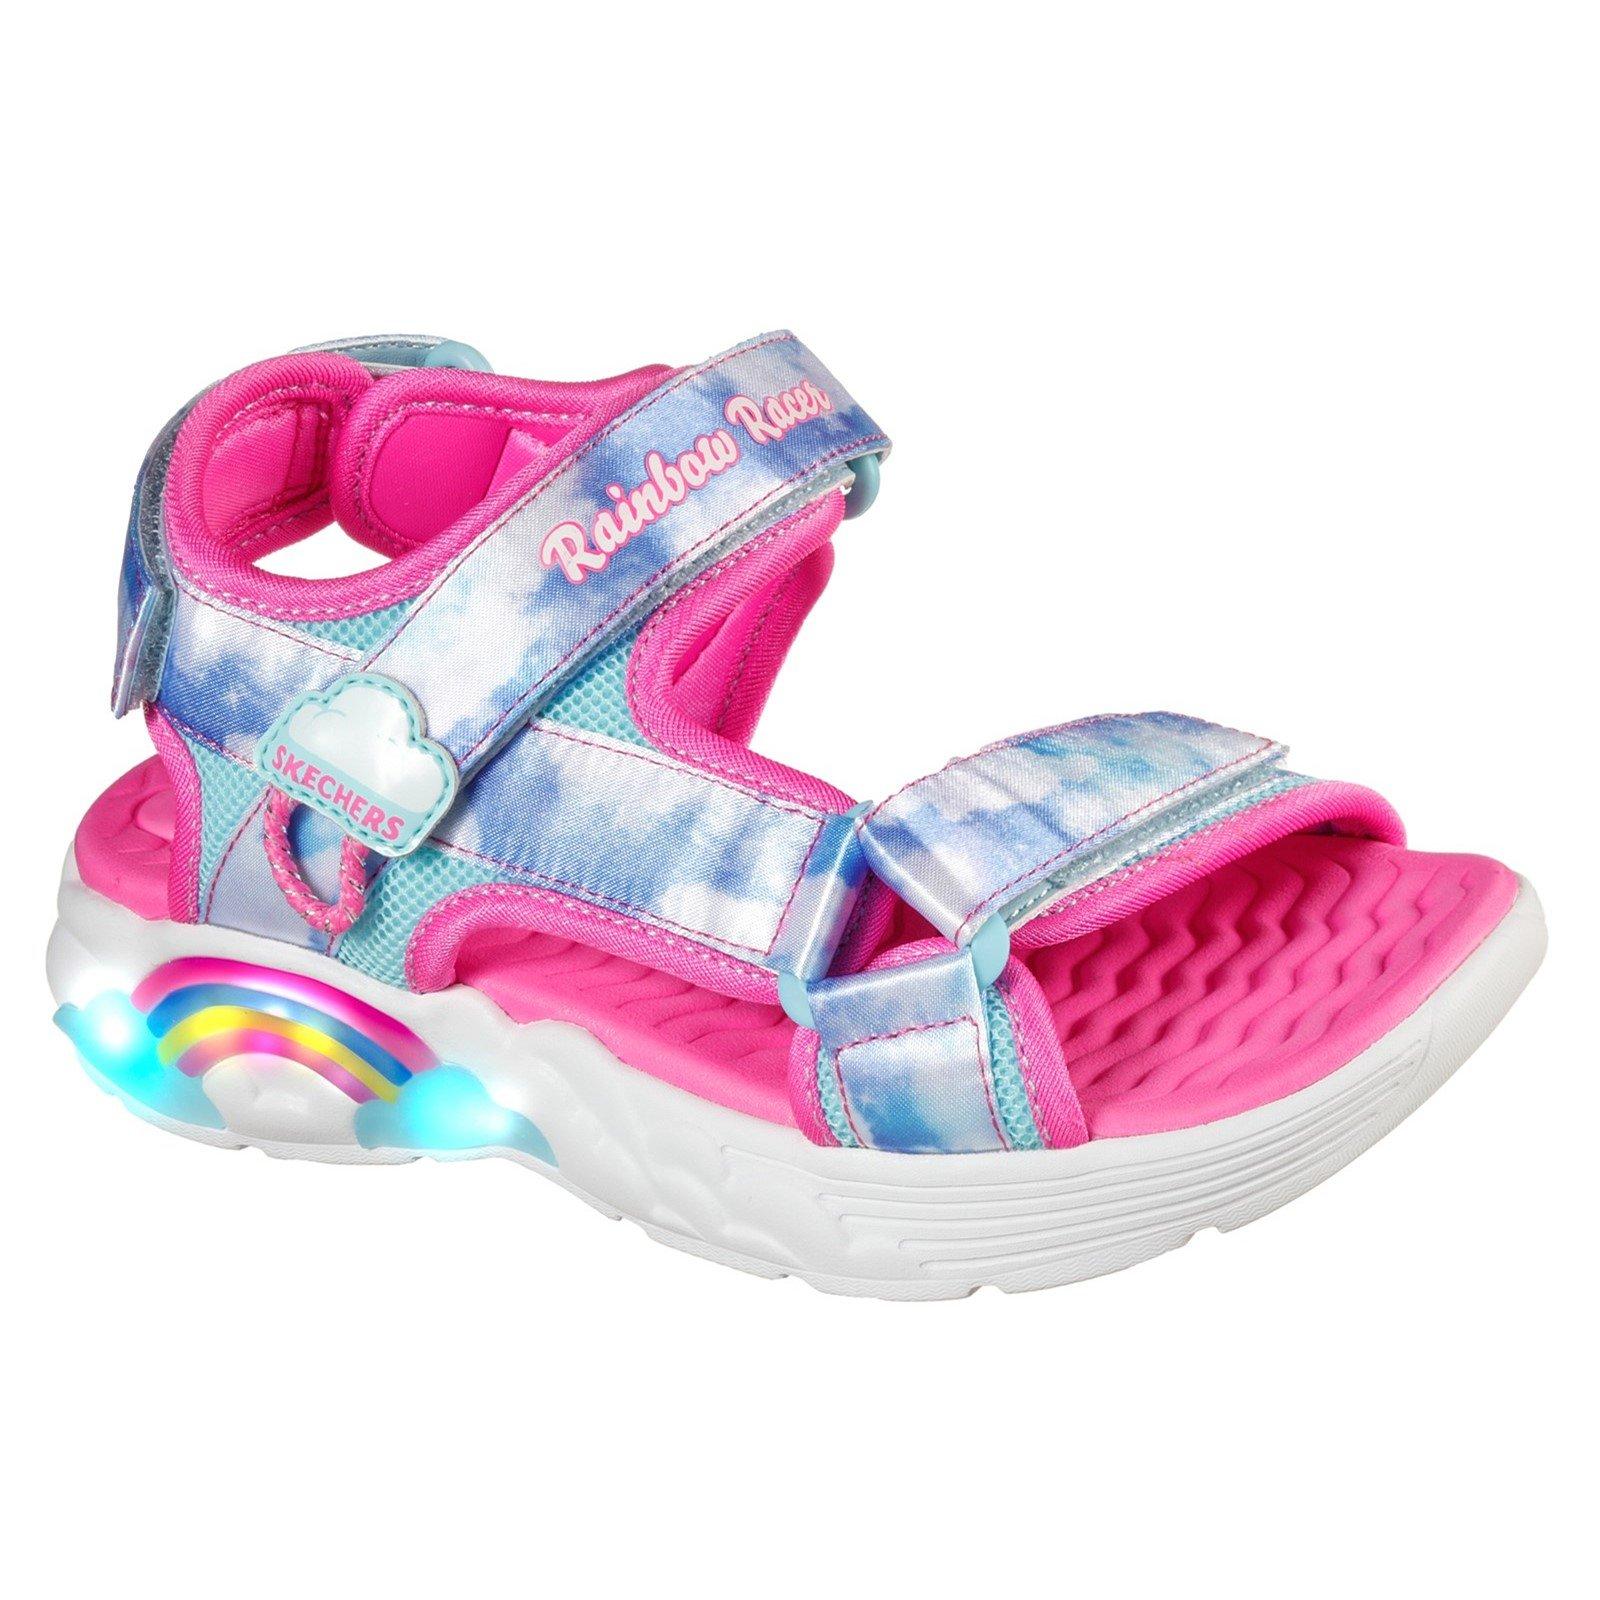 Skechers Unisex Rainbow Racer Summer Sky Beach Sandals Multicolor 32096 - Pink/Light Blue Pu 8